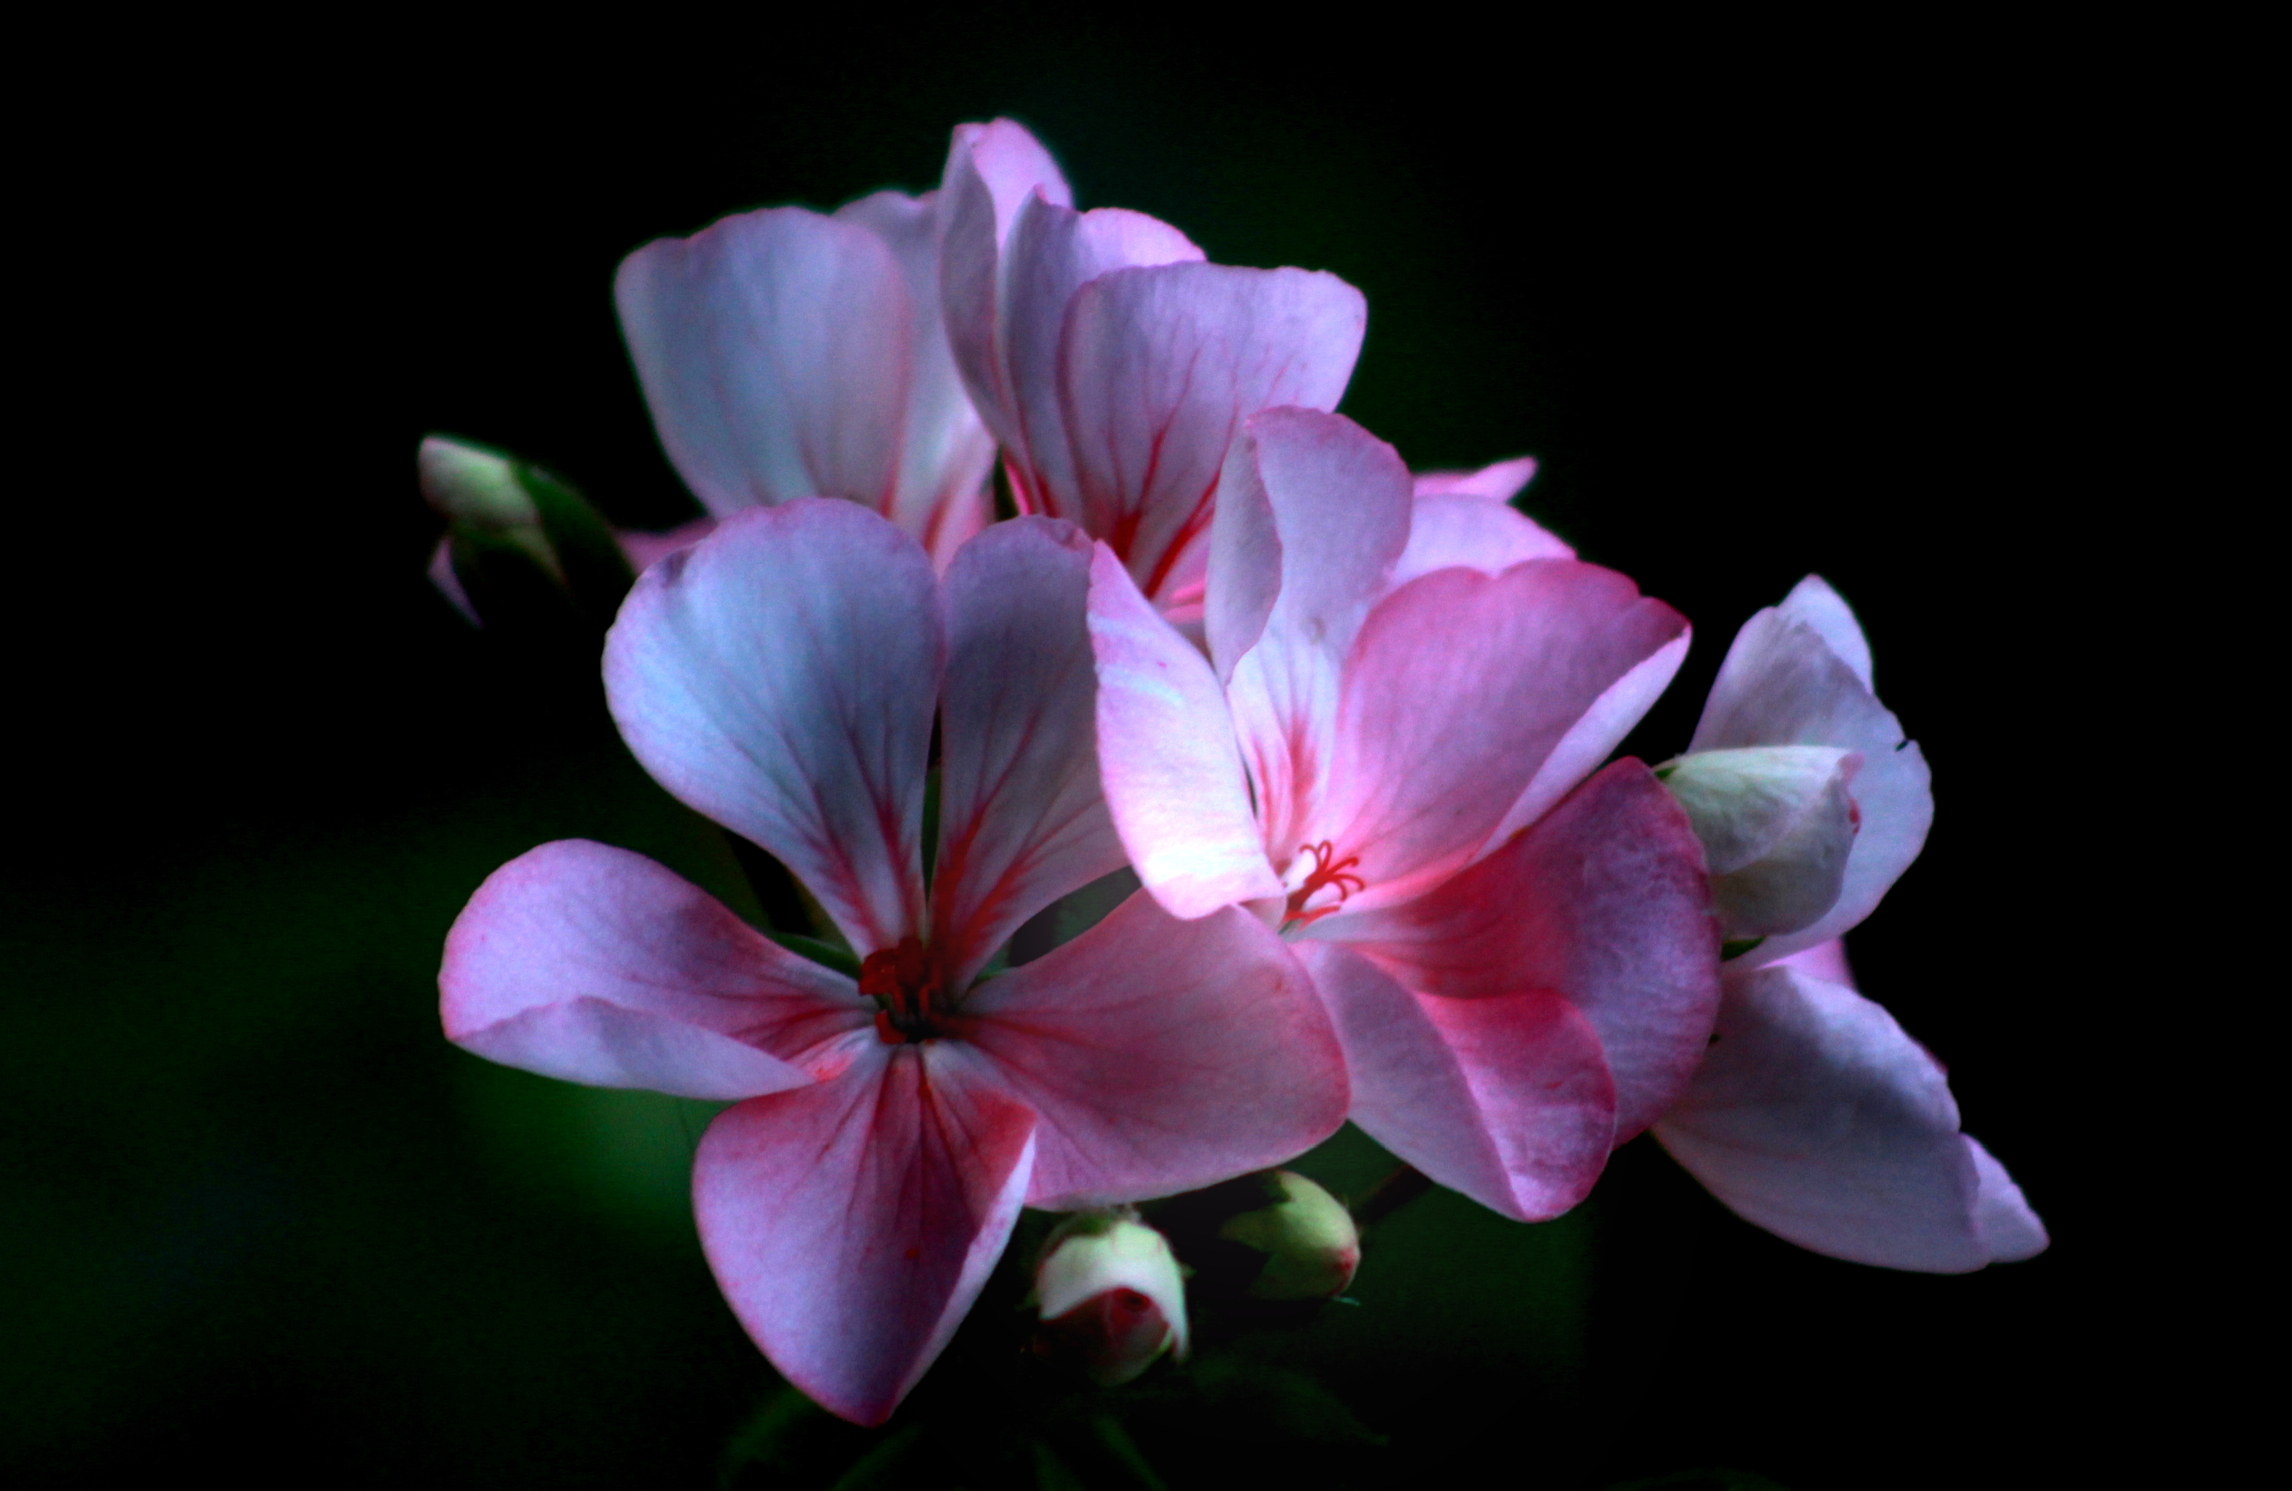 pink begonia with dark background